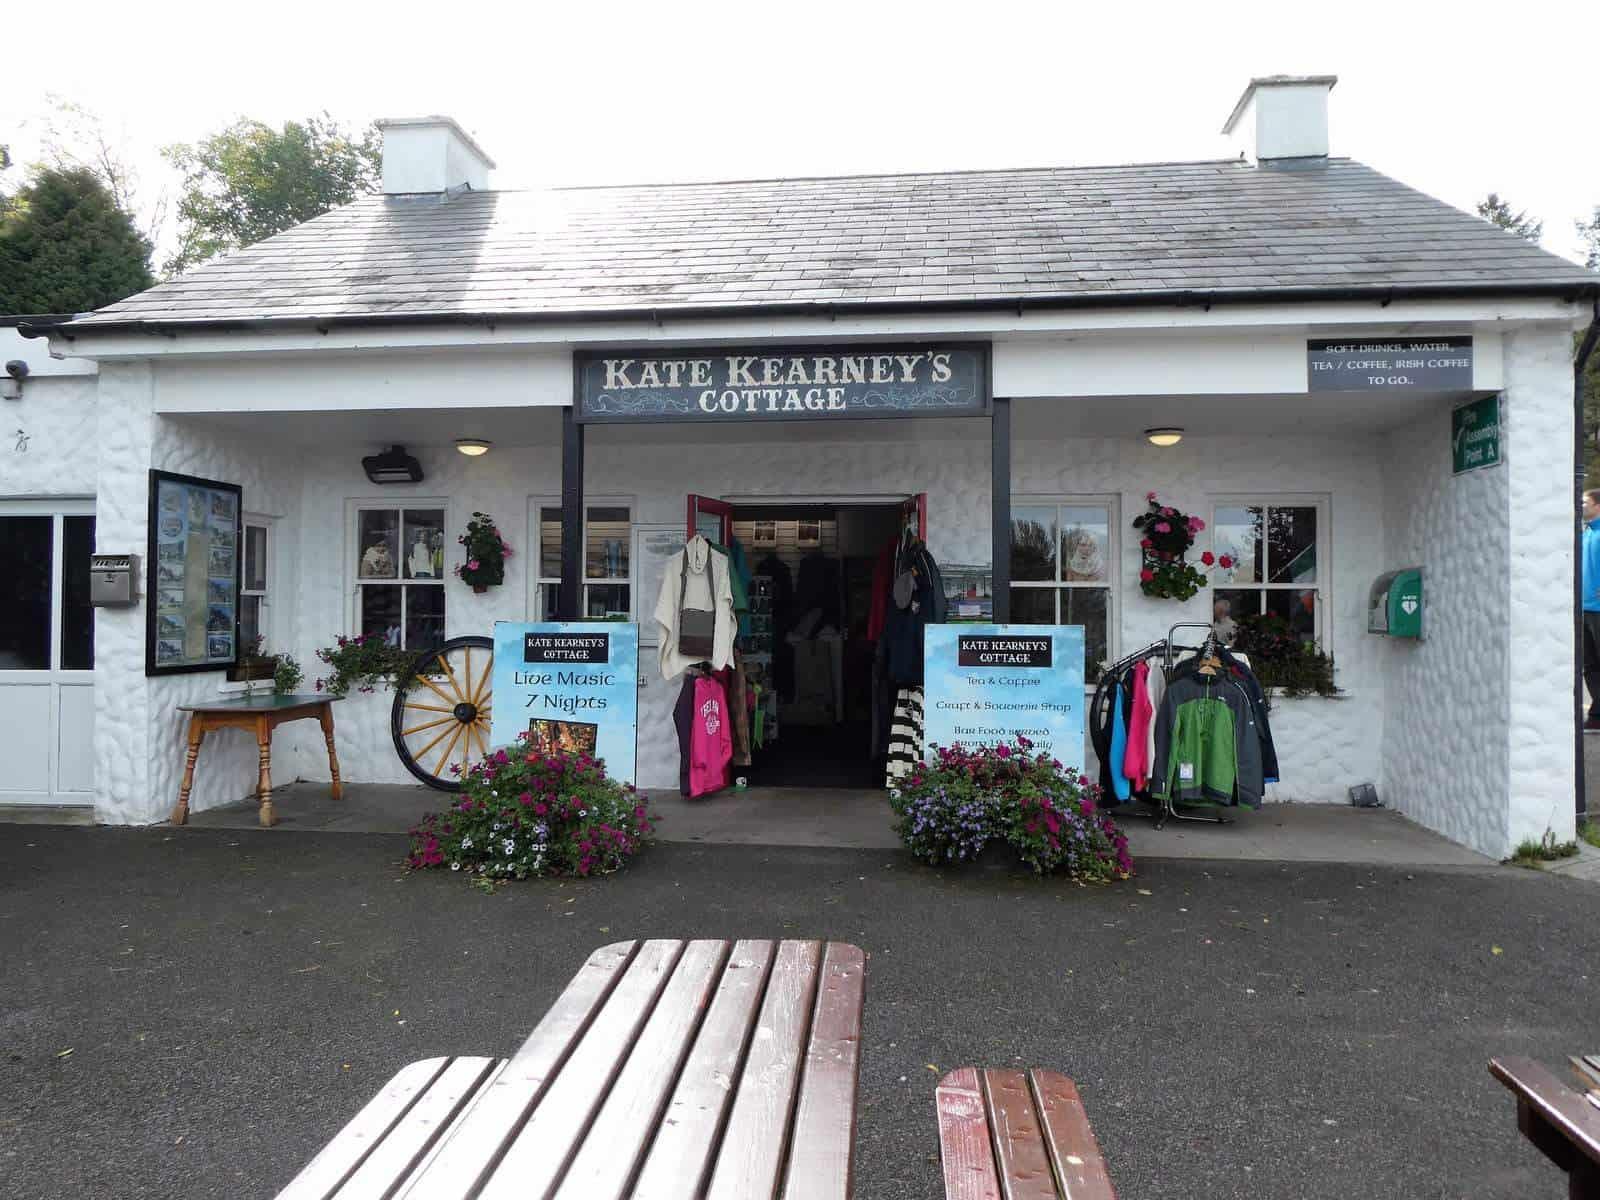 Kate Kearneys Cottage